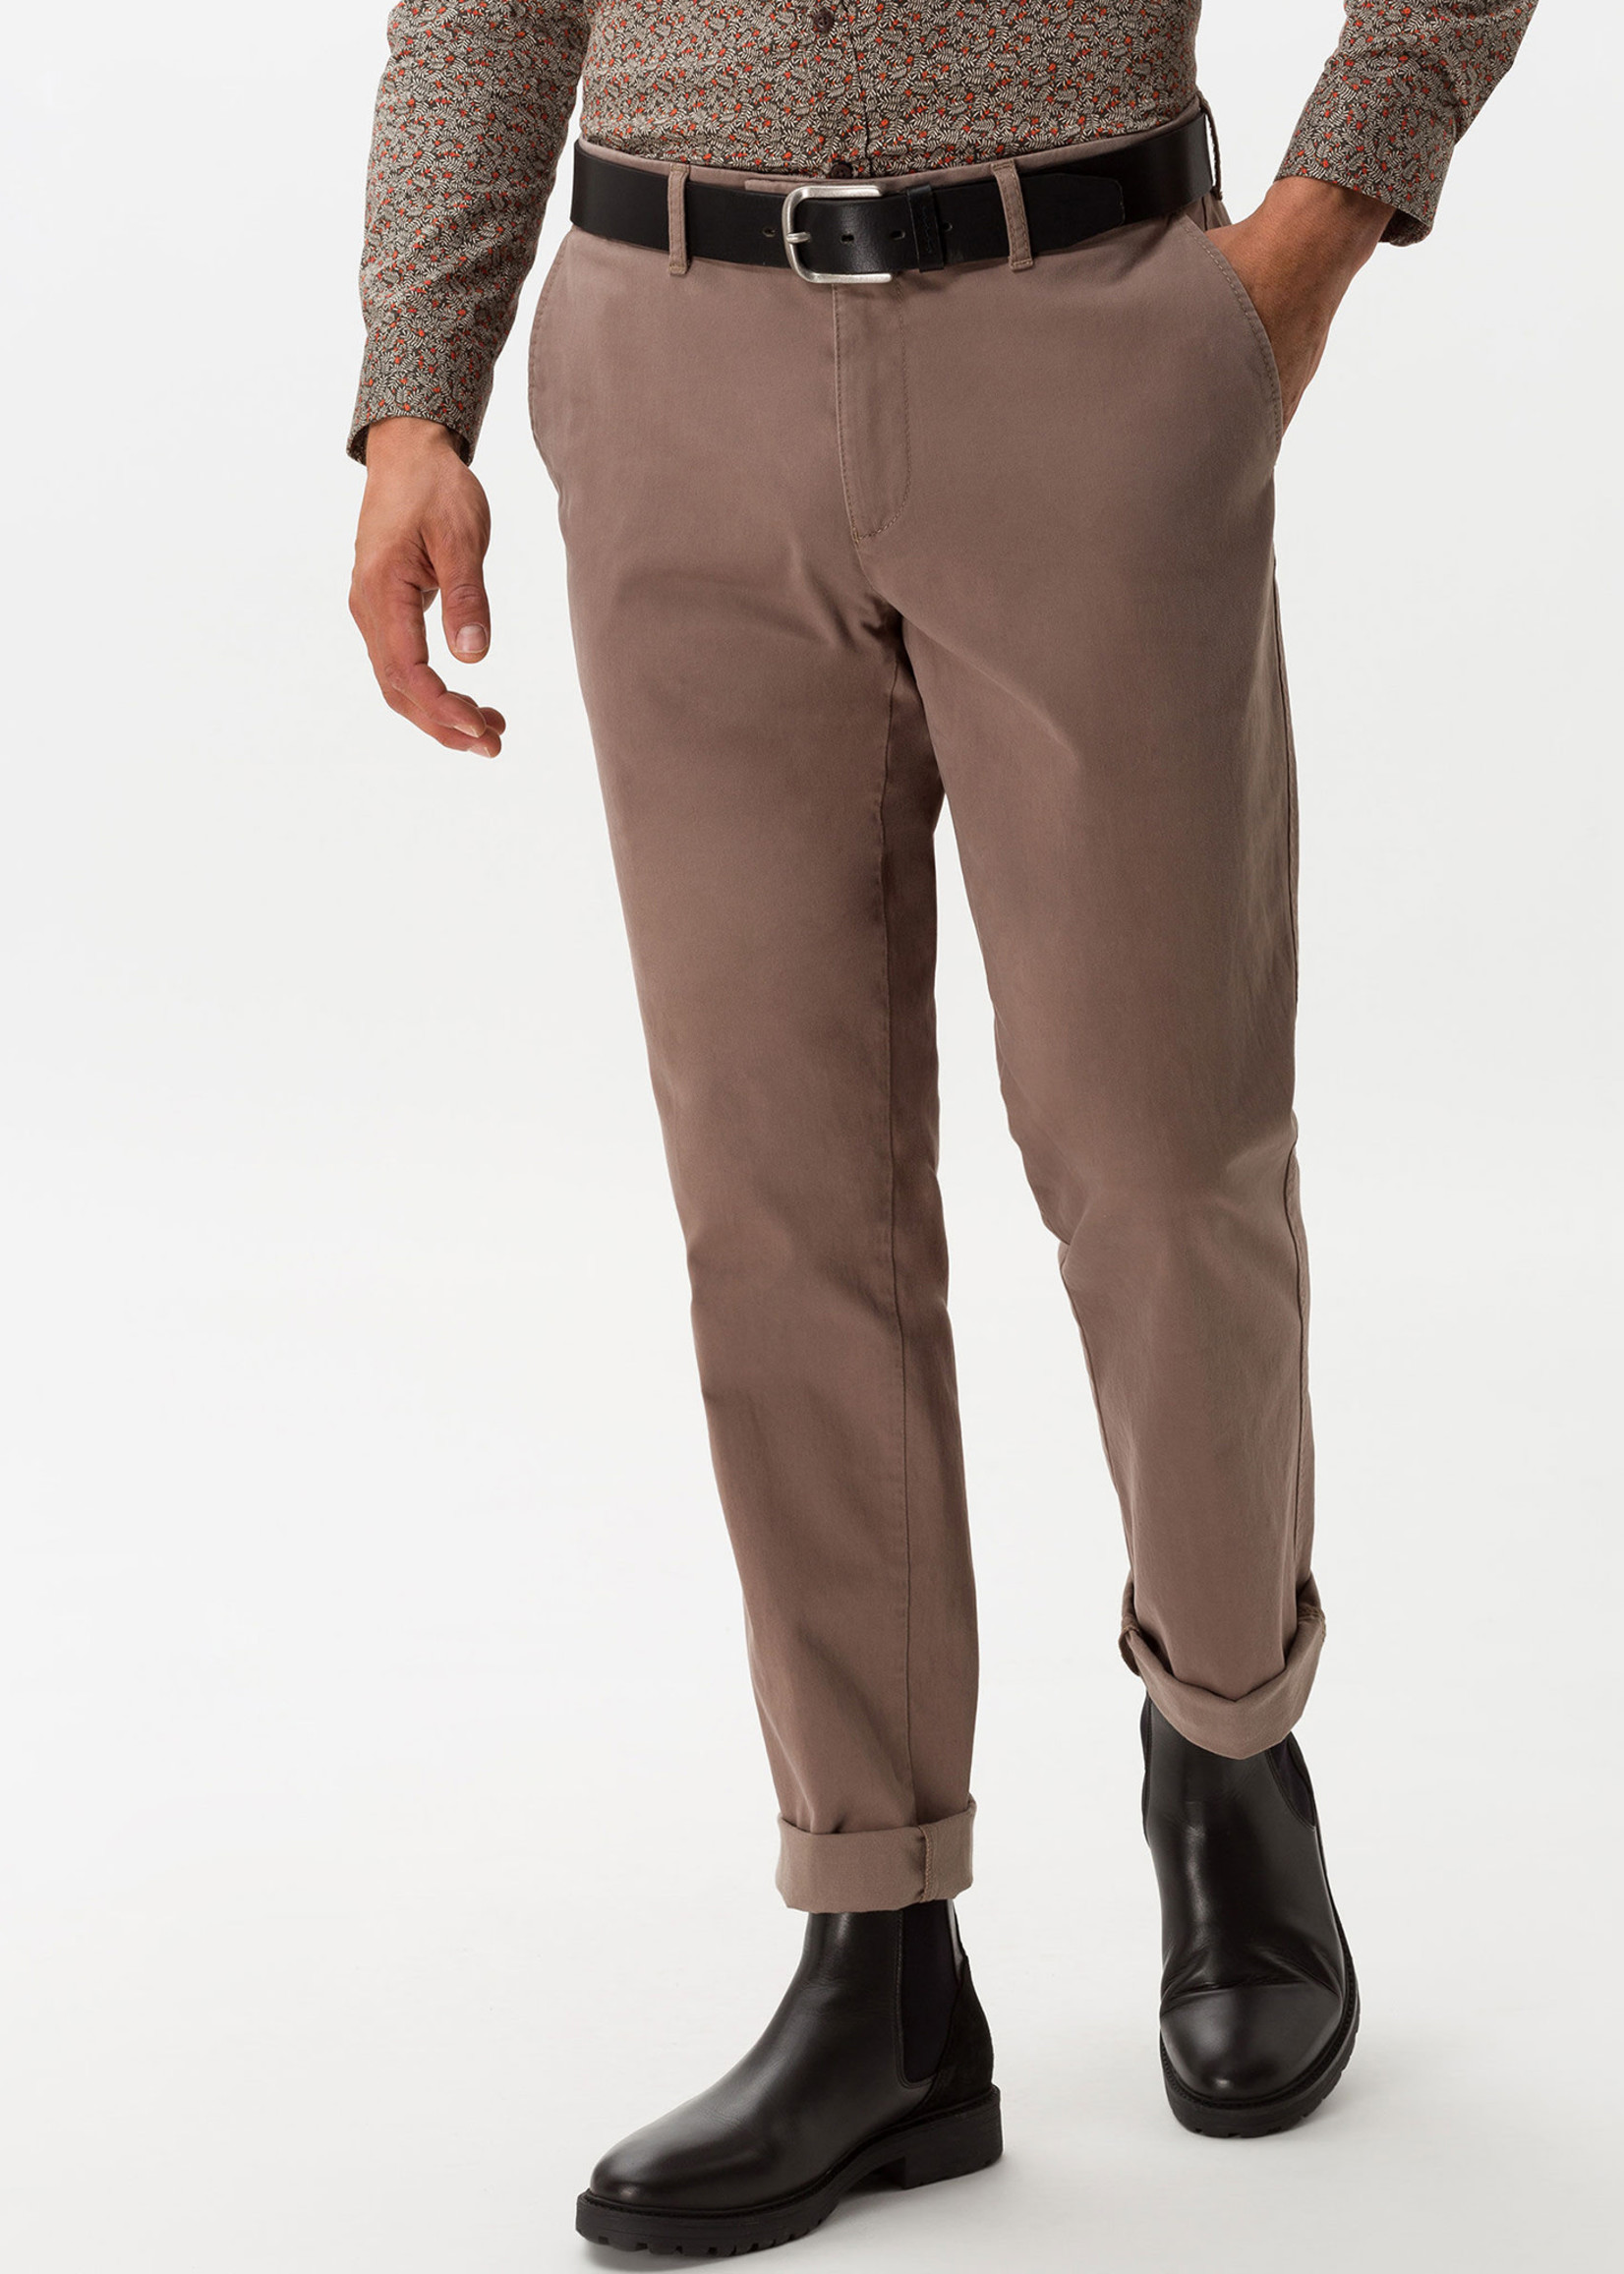 BRAX Kapok 2 Evans Trouser Khaki Cotton